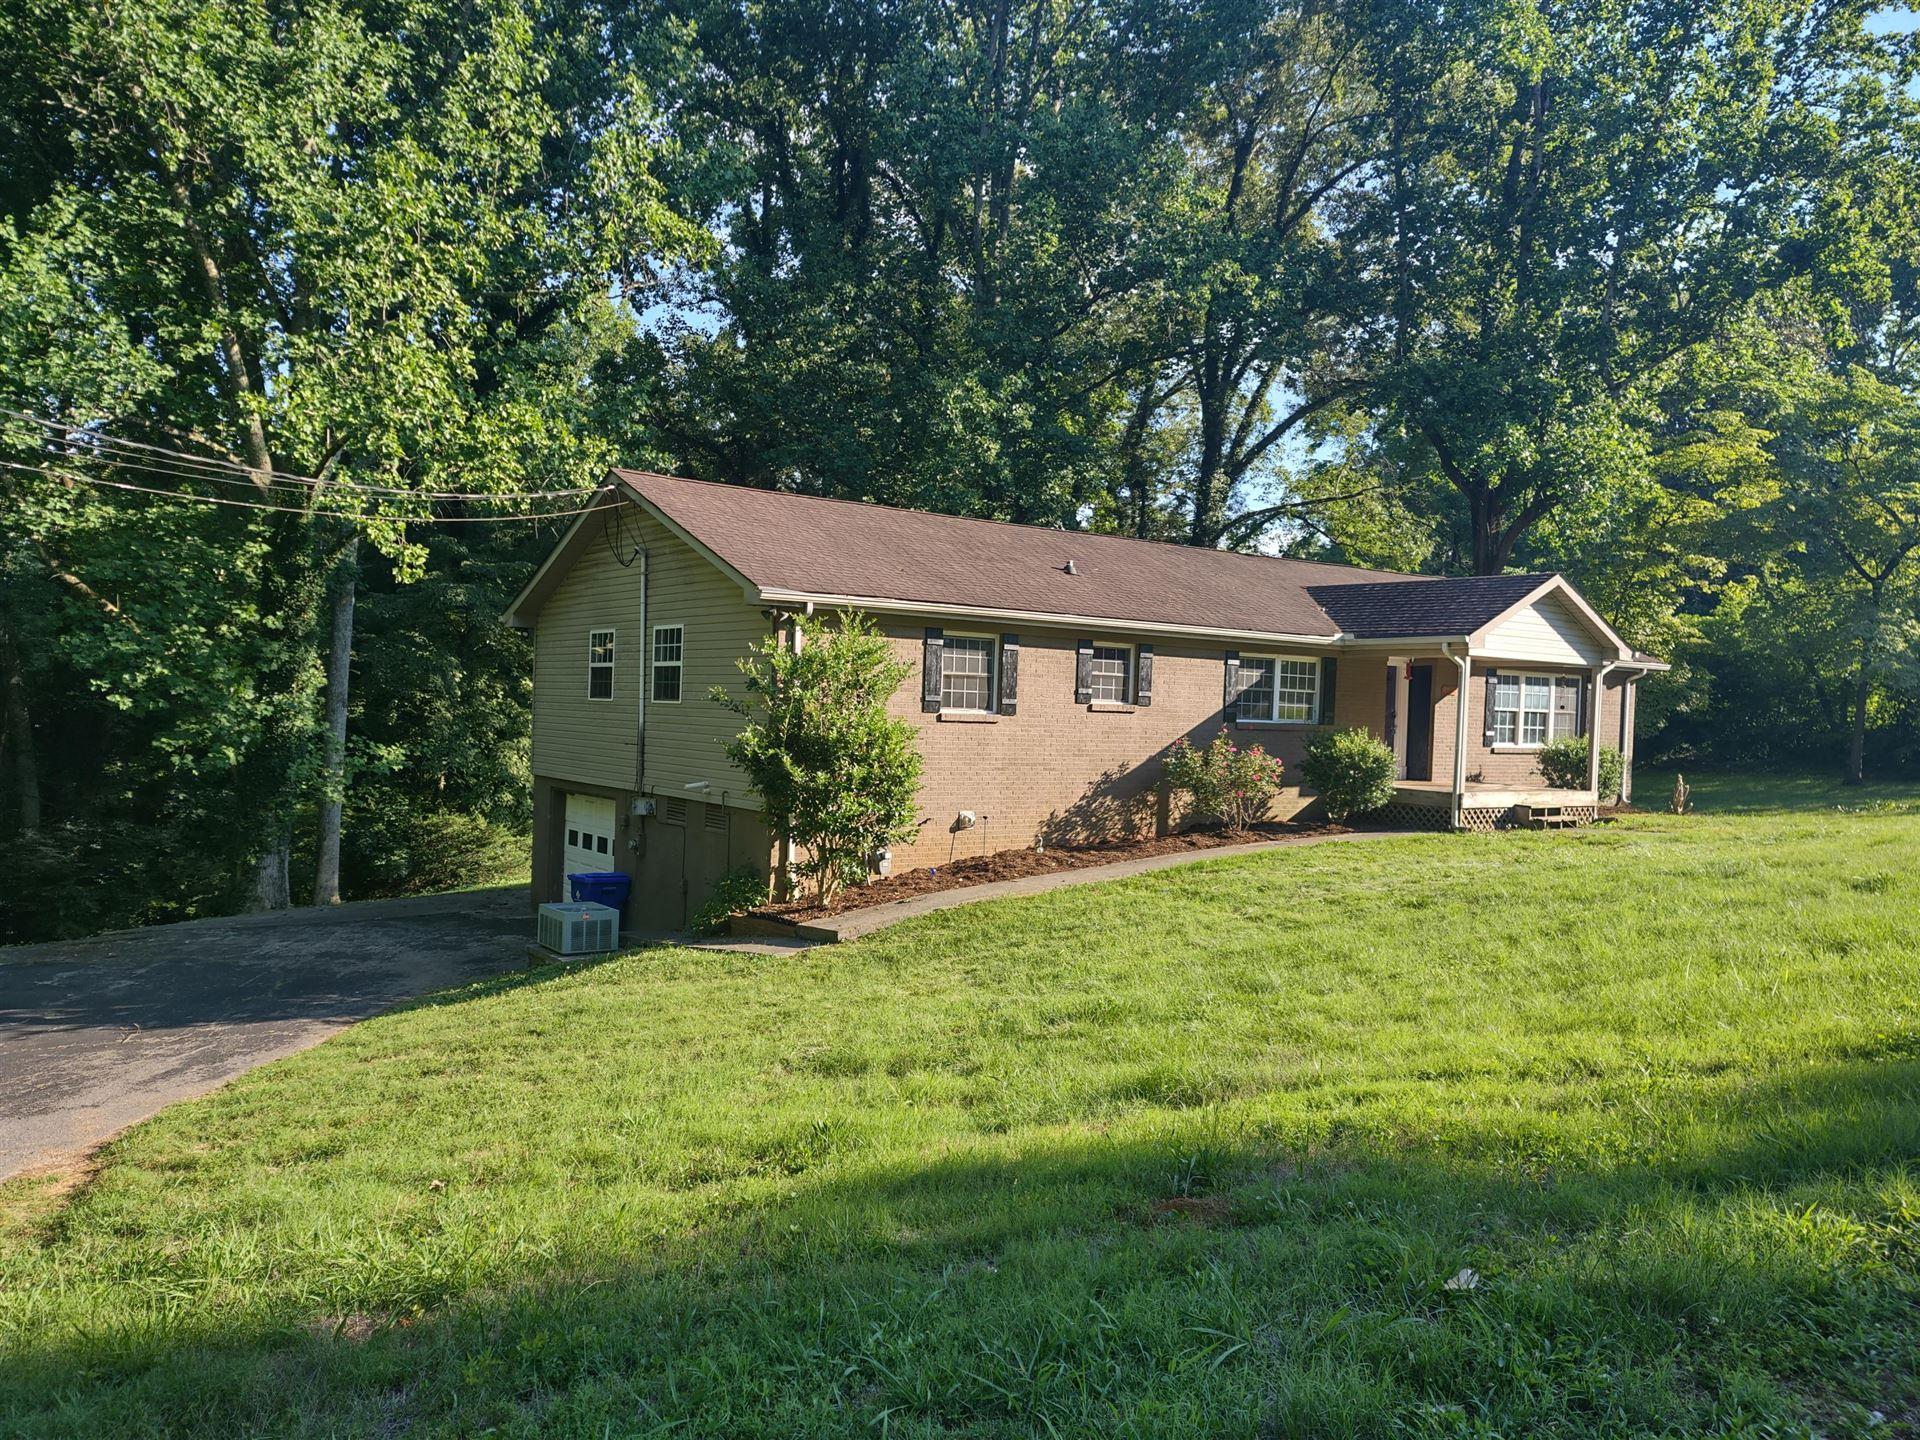 Photo of 739 Robertsville Rd, Oak Ridge, TN 37830 (MLS # 1161669)